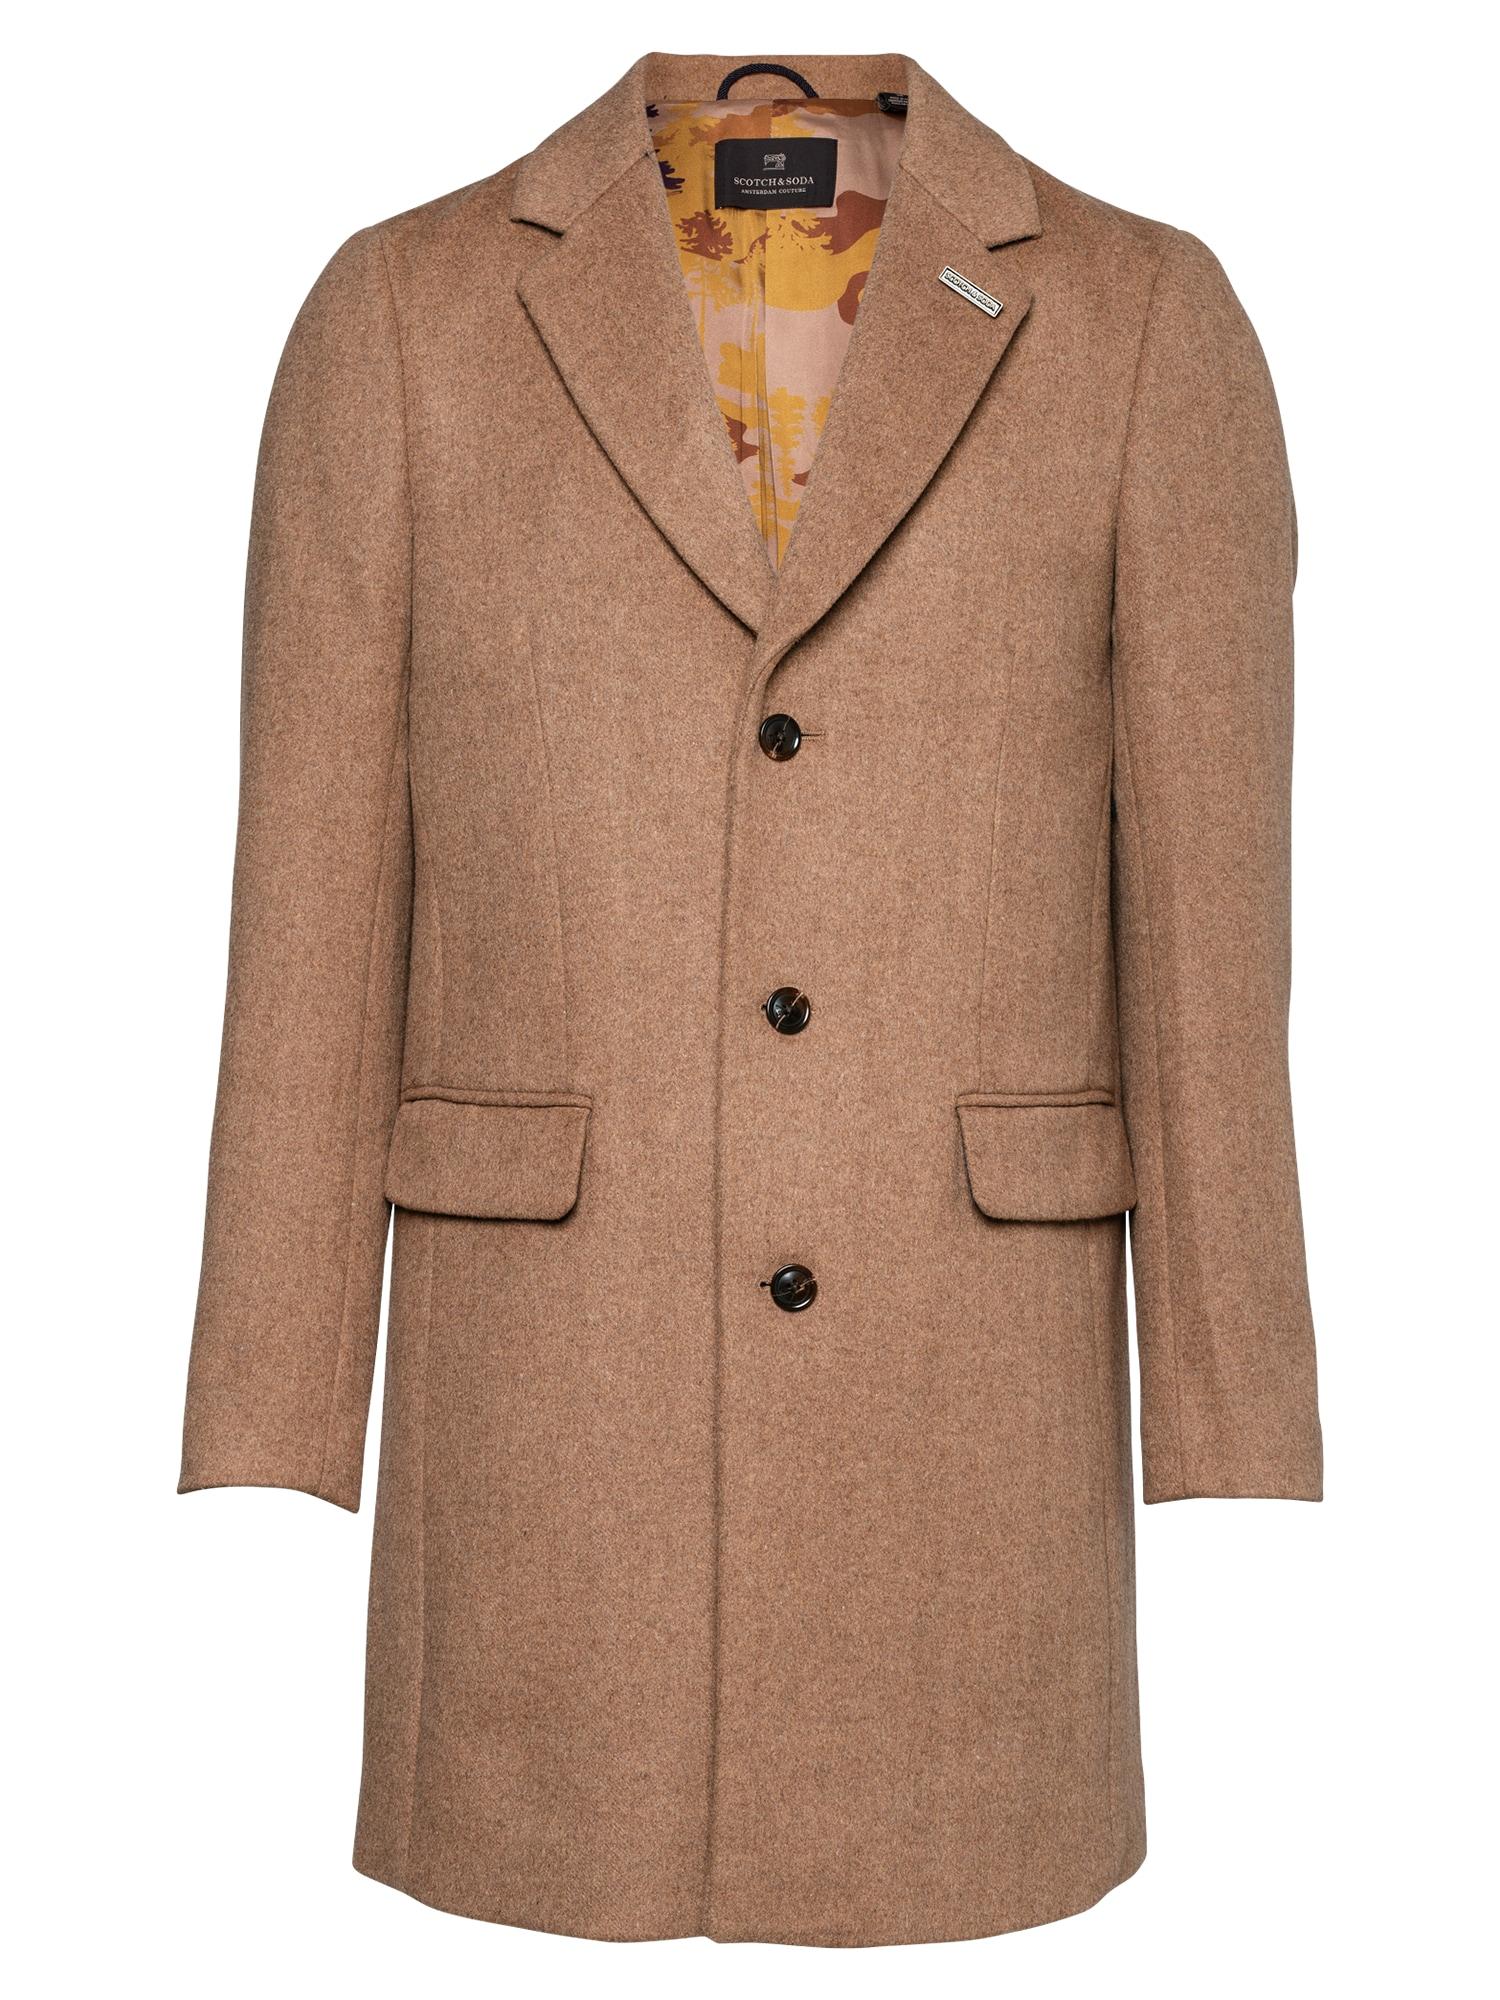 SCOTCH & SODA Demisezoninis paltas margai ruda